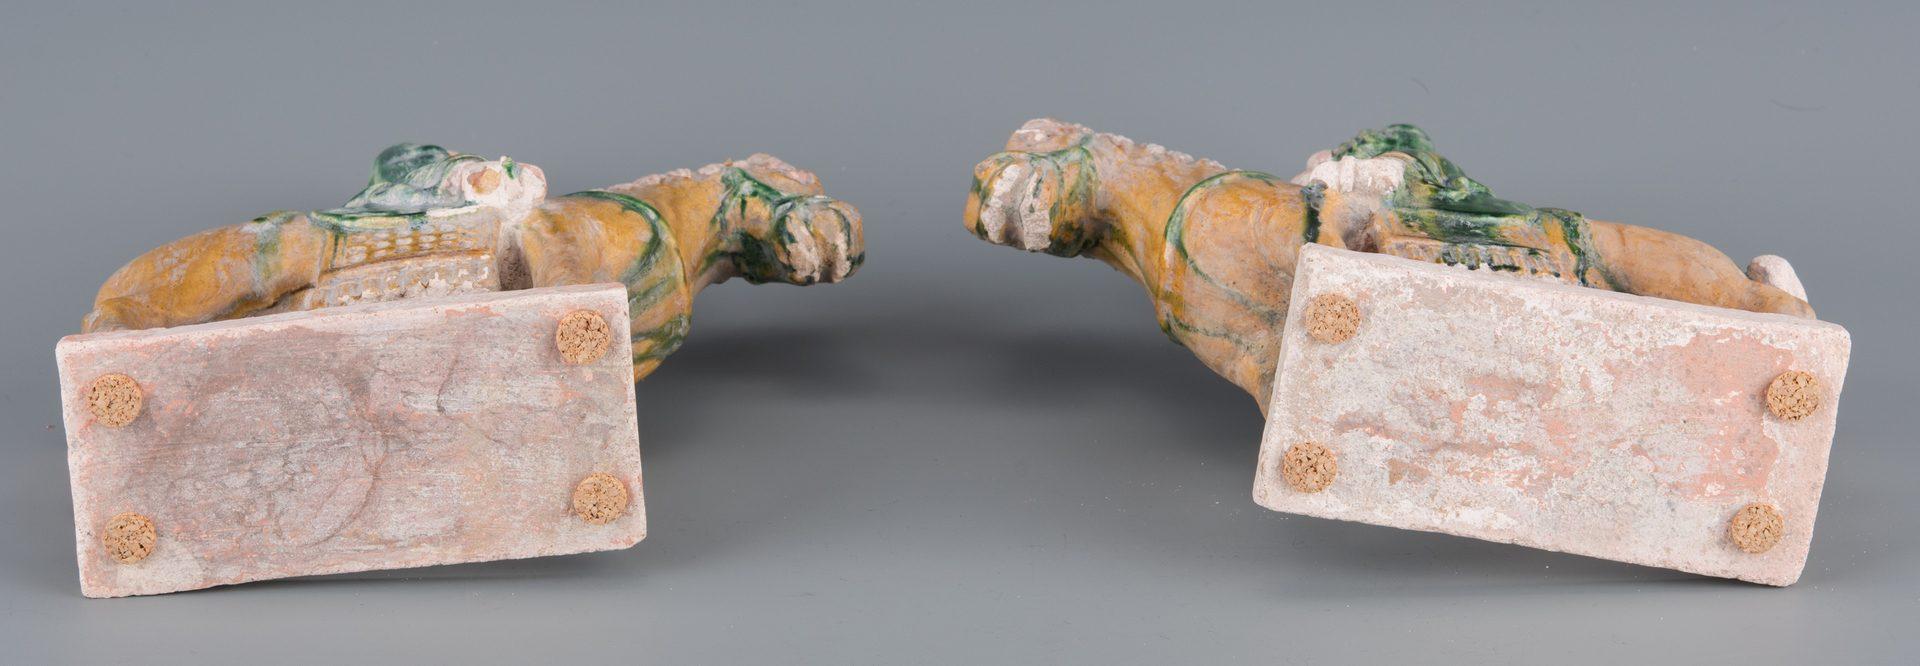 Lot 271: Pr. Chinese Ceramic Horse w/ Riders Figurines